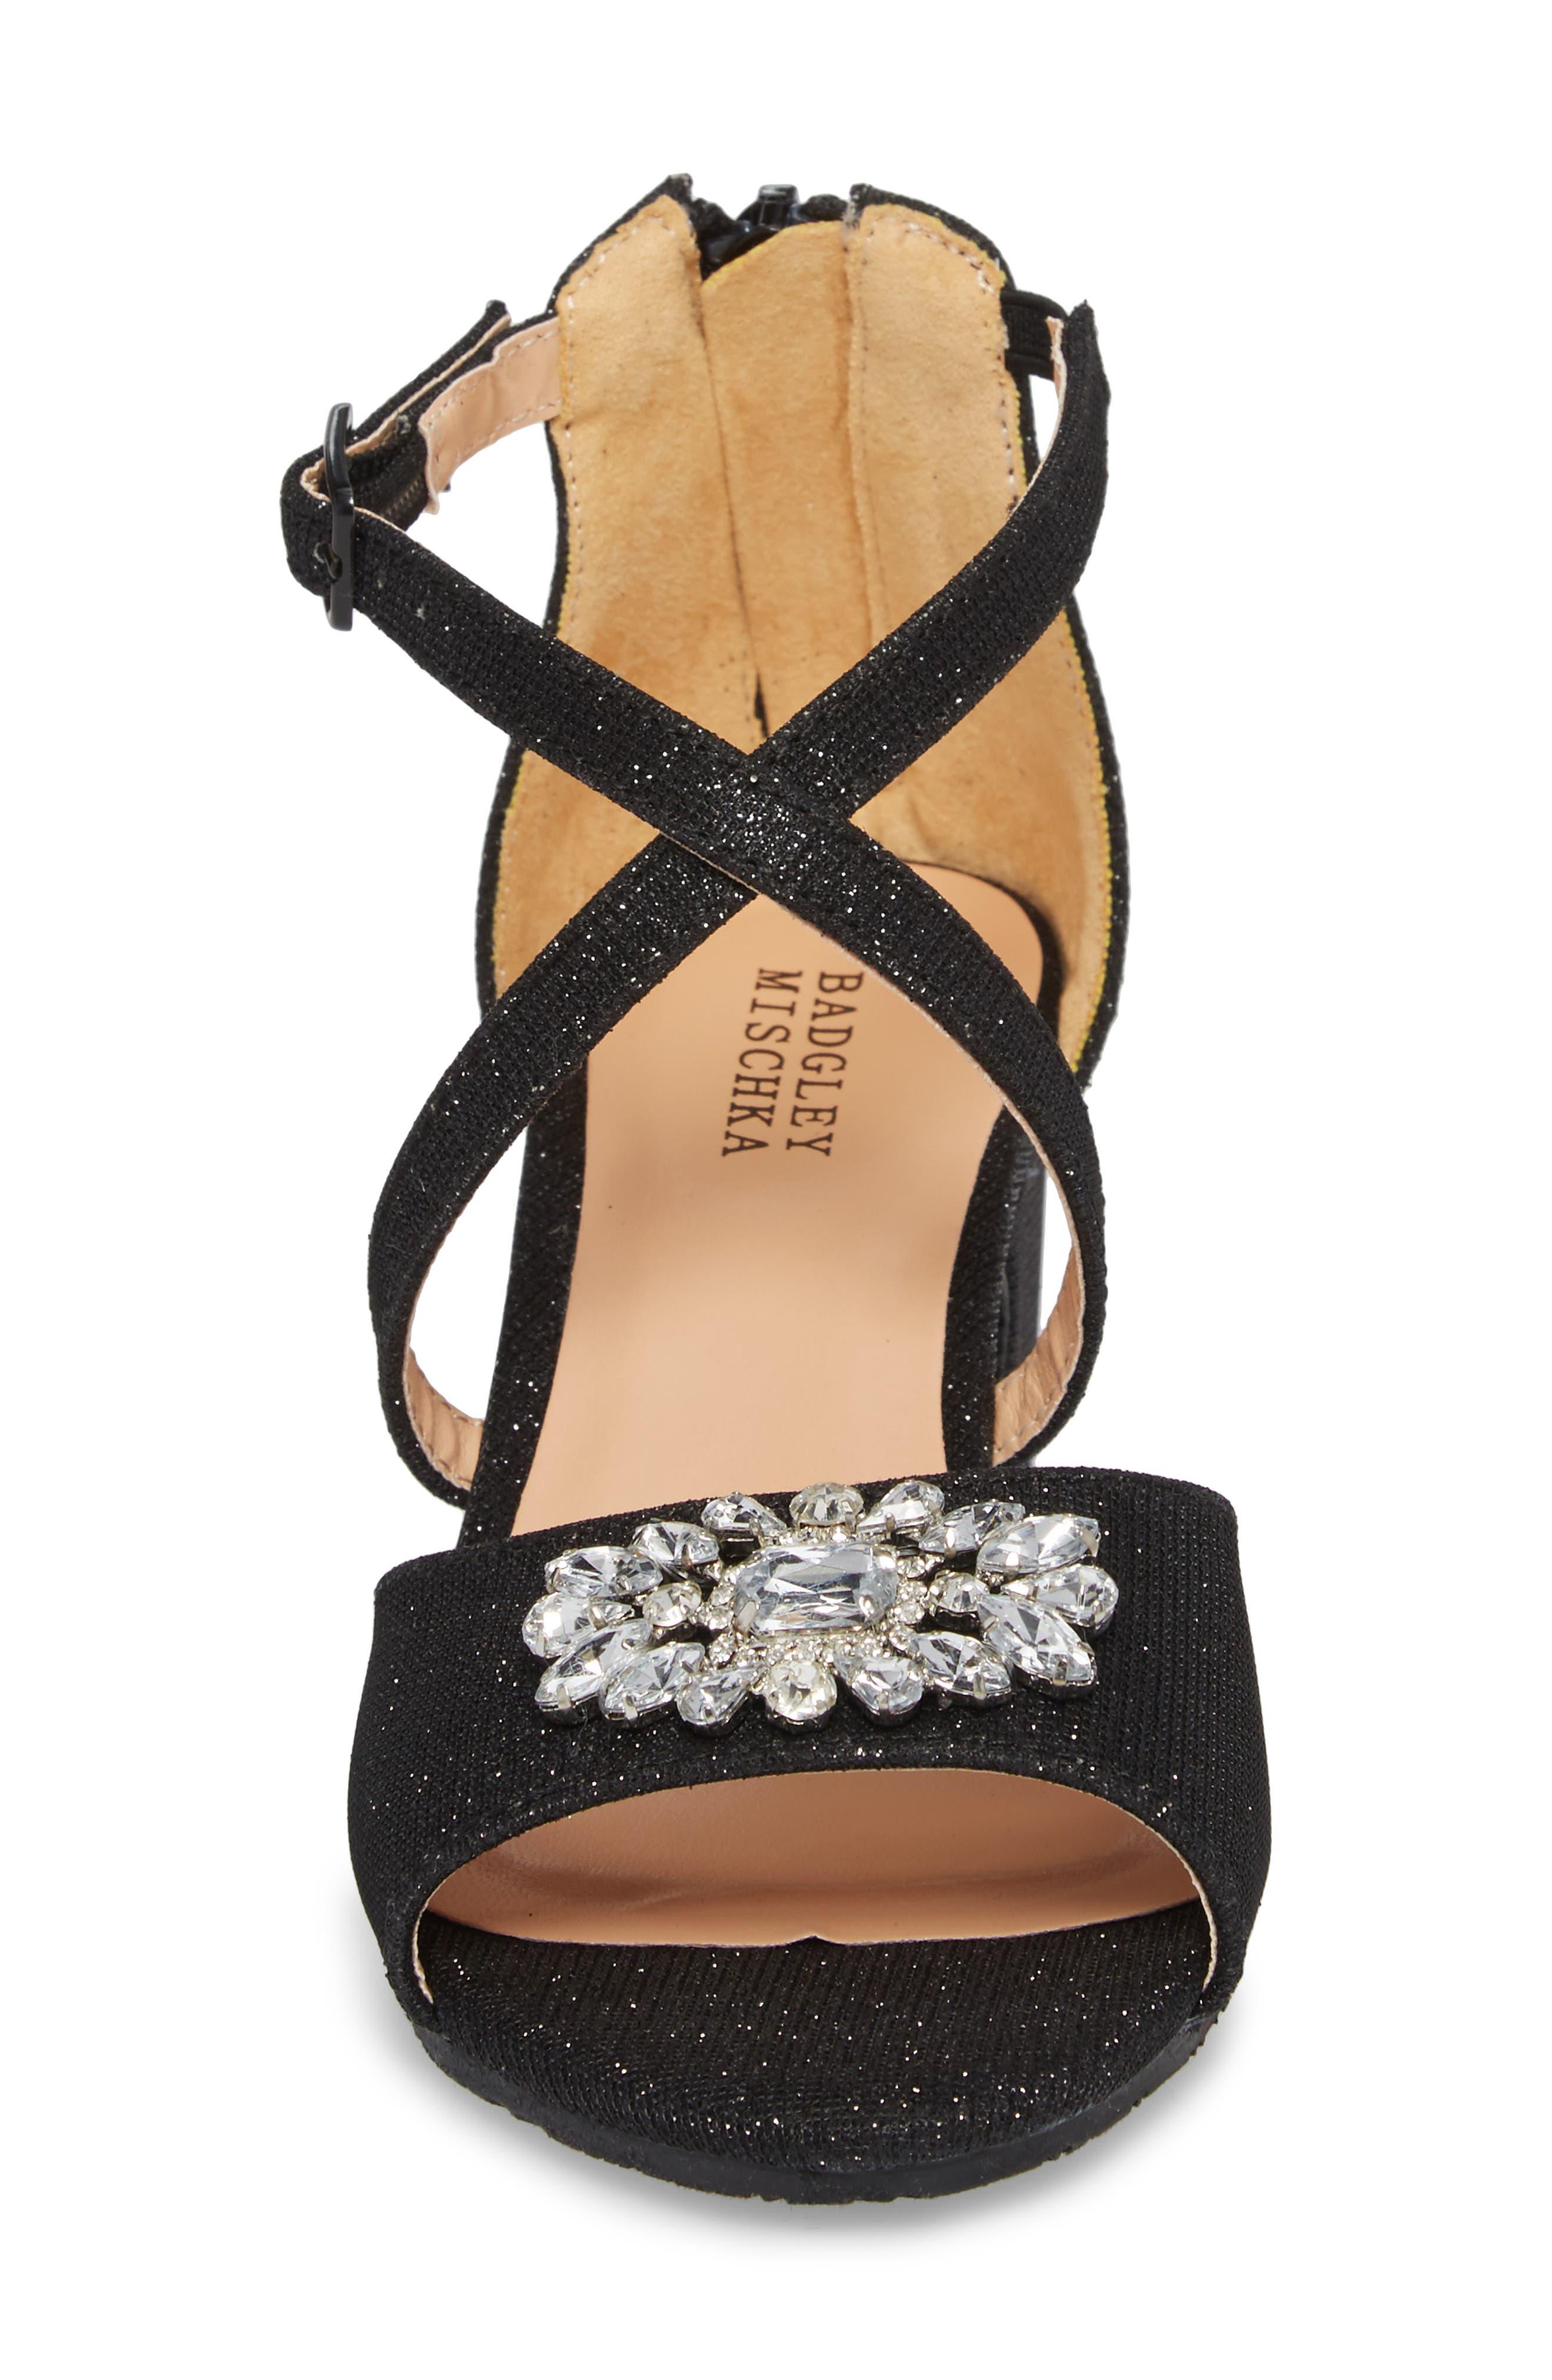 Pernia Gems Sandal,                             Alternate thumbnail 4, color,                             BLACK